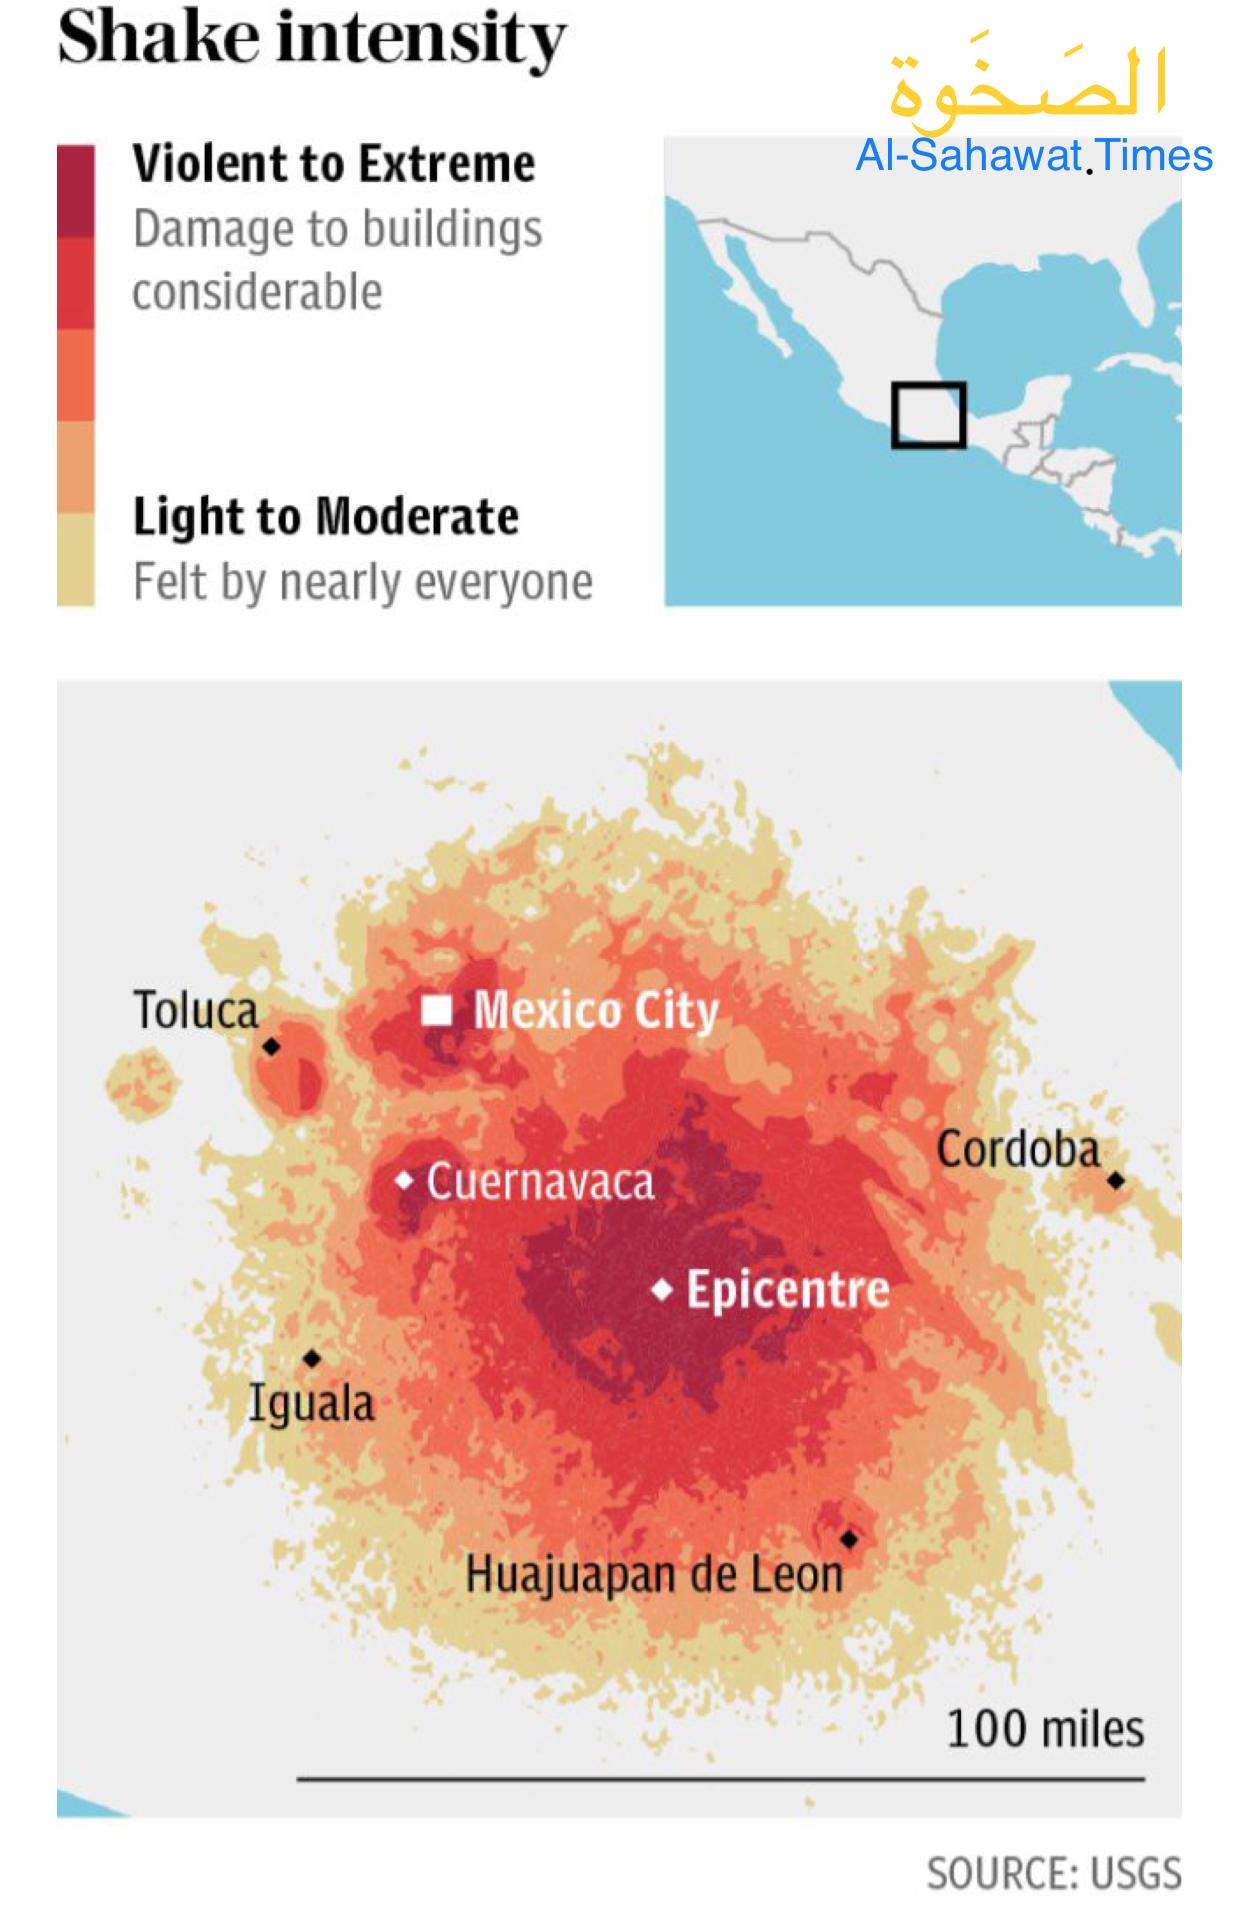 Al-Sahawat Times Mexico City Earthquake